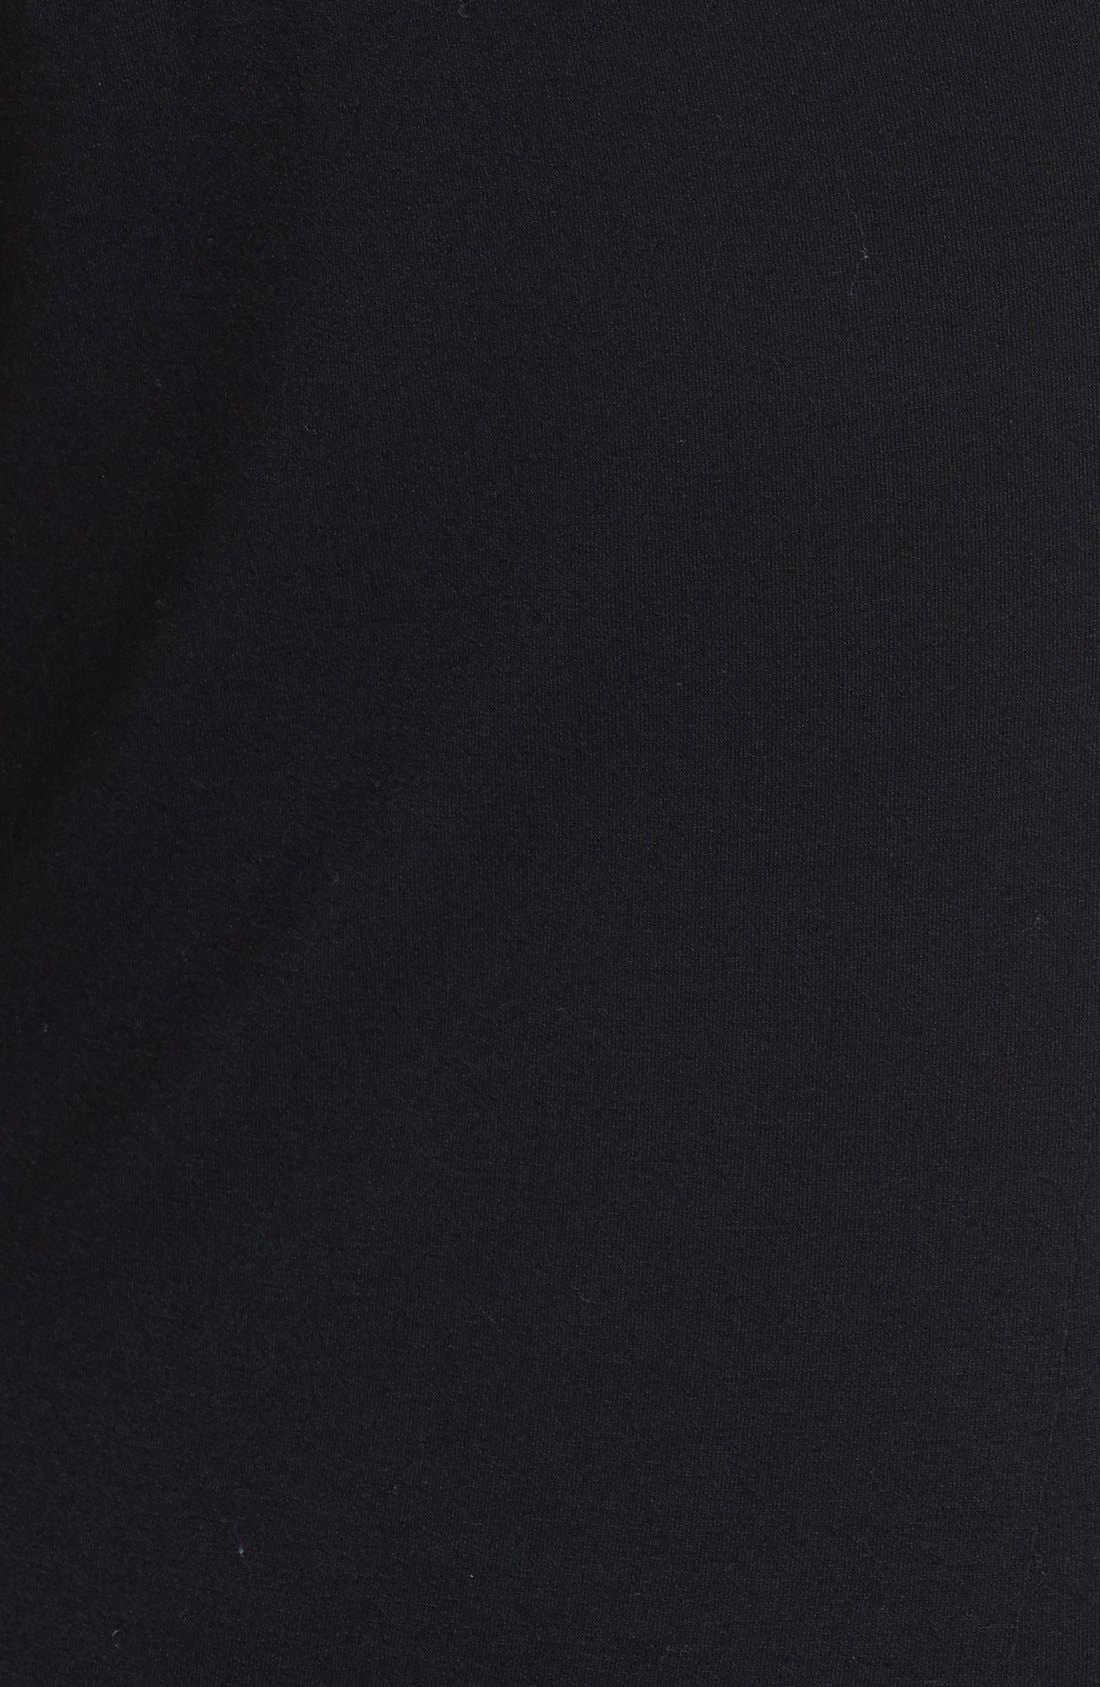 Alternate Image 3  - Vince Camuto Colorblock Sleeveless Top (Regular & Petite)